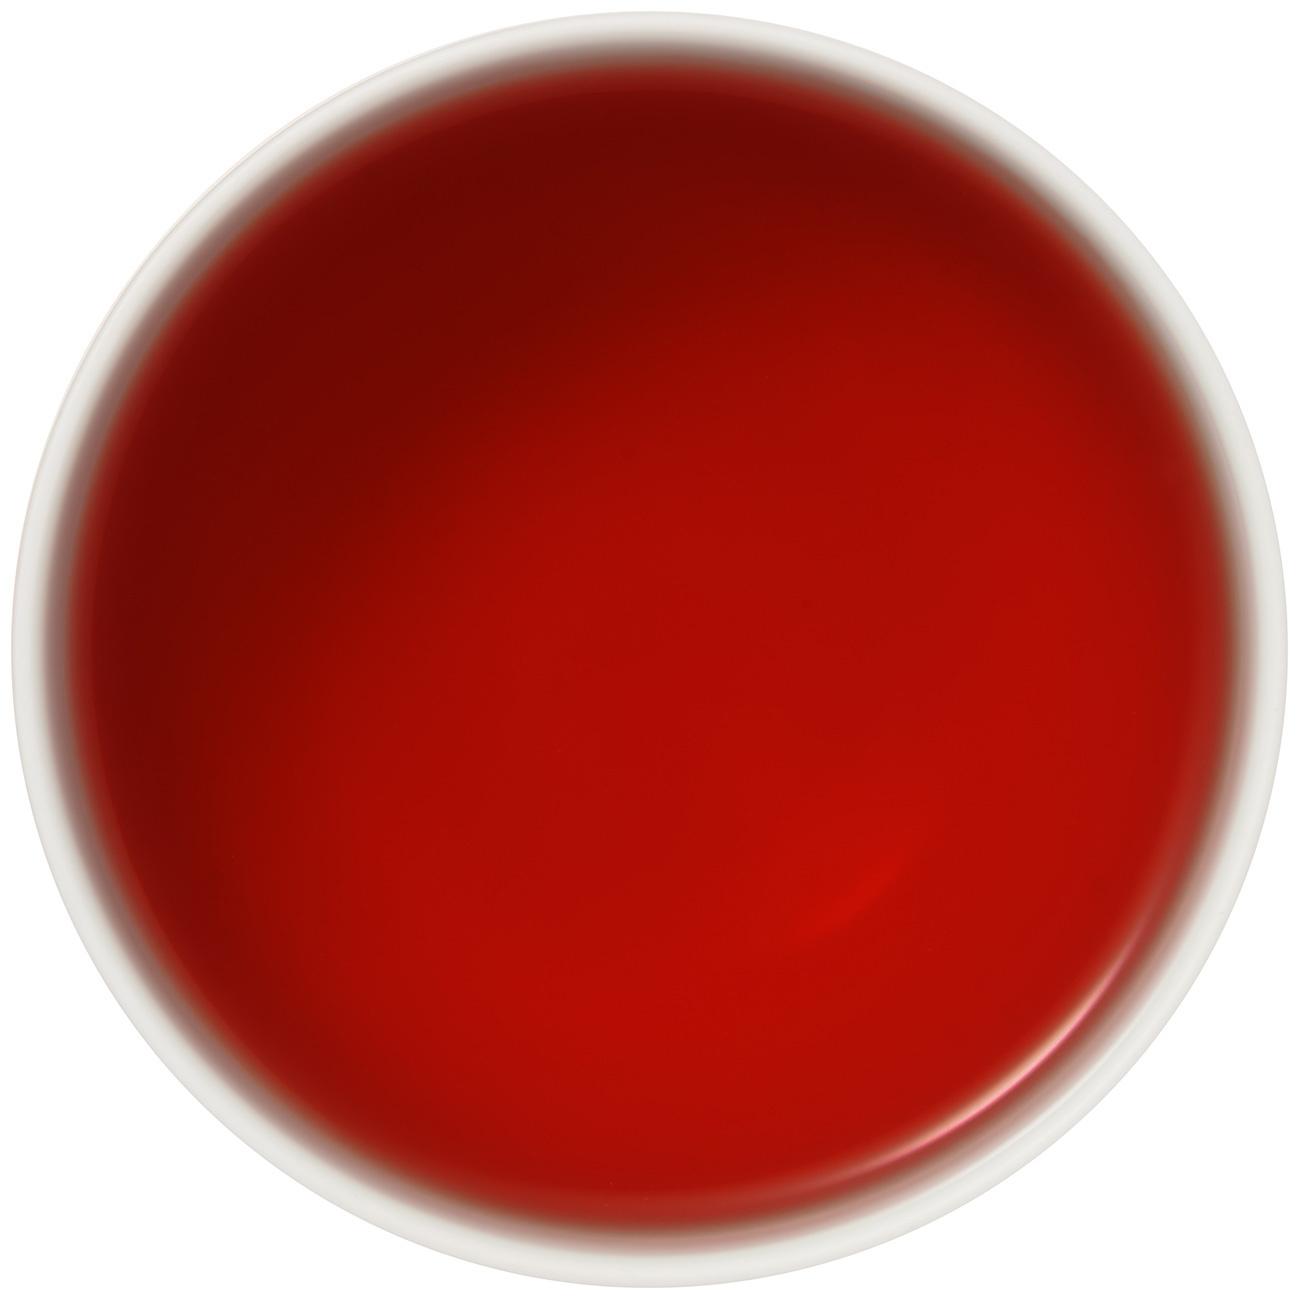 Aardbei Kiwi thee-3